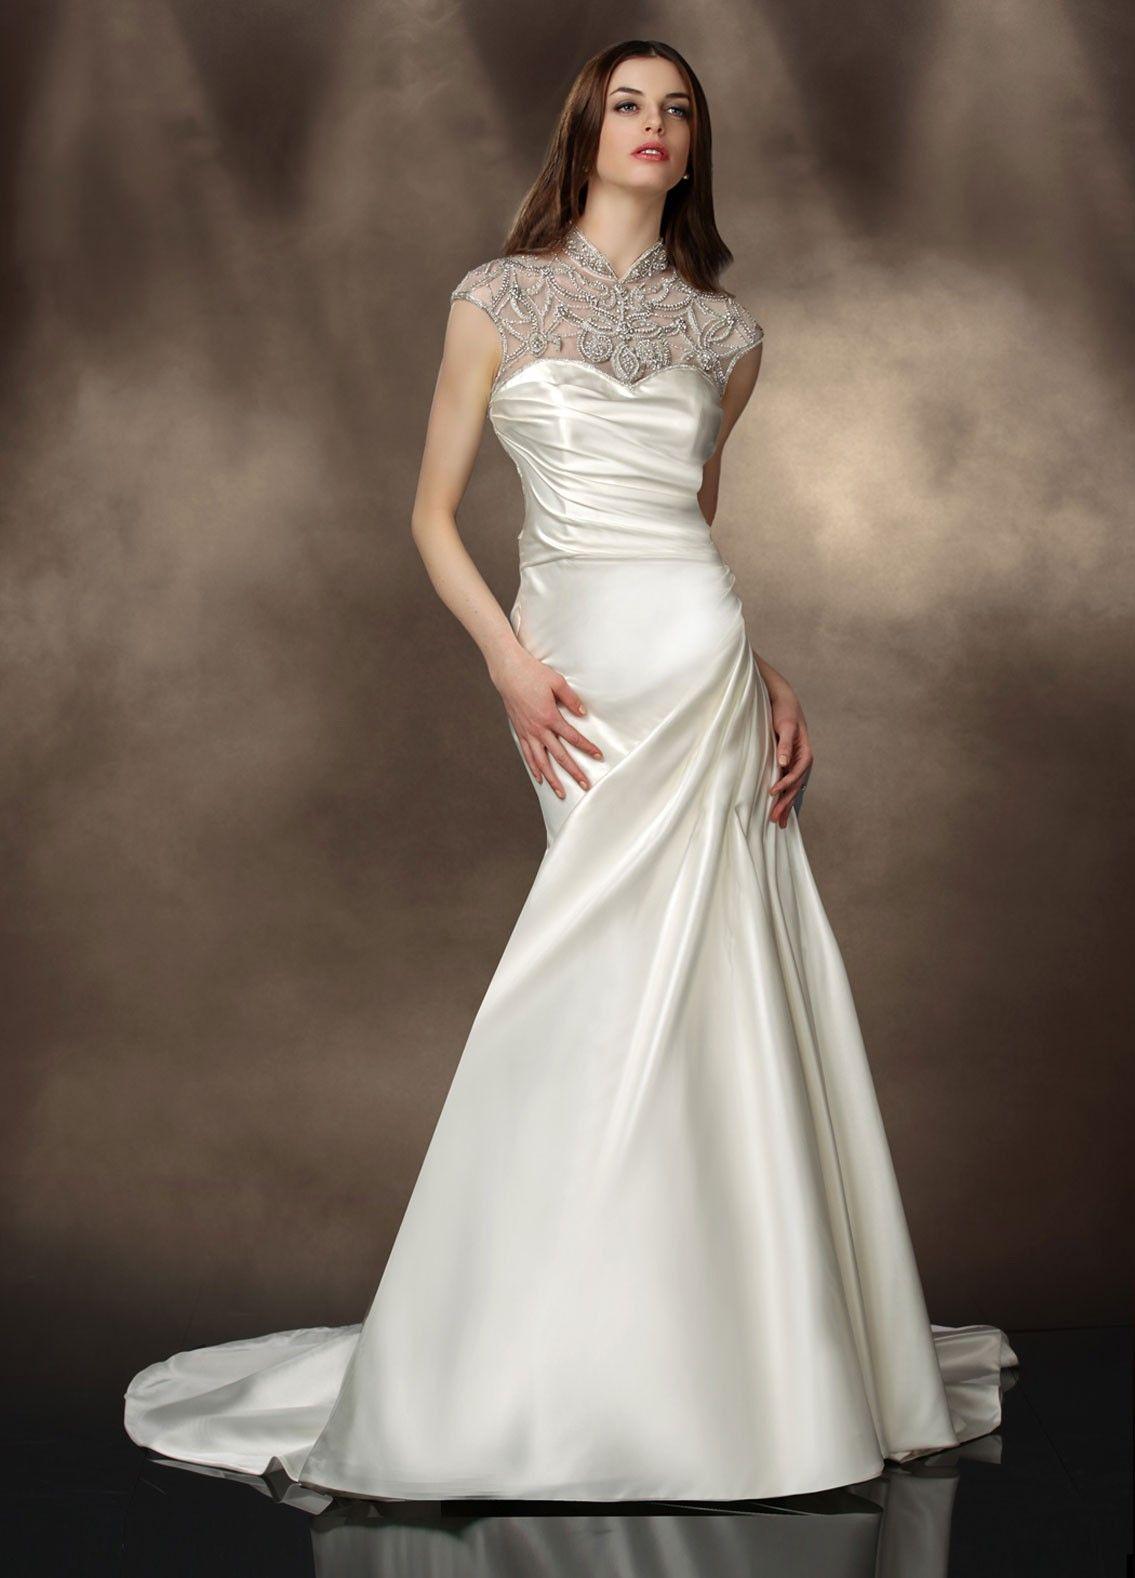 Impression Wedding Dresses - Style 10182 #vintage #wedding #dresses #fall2013